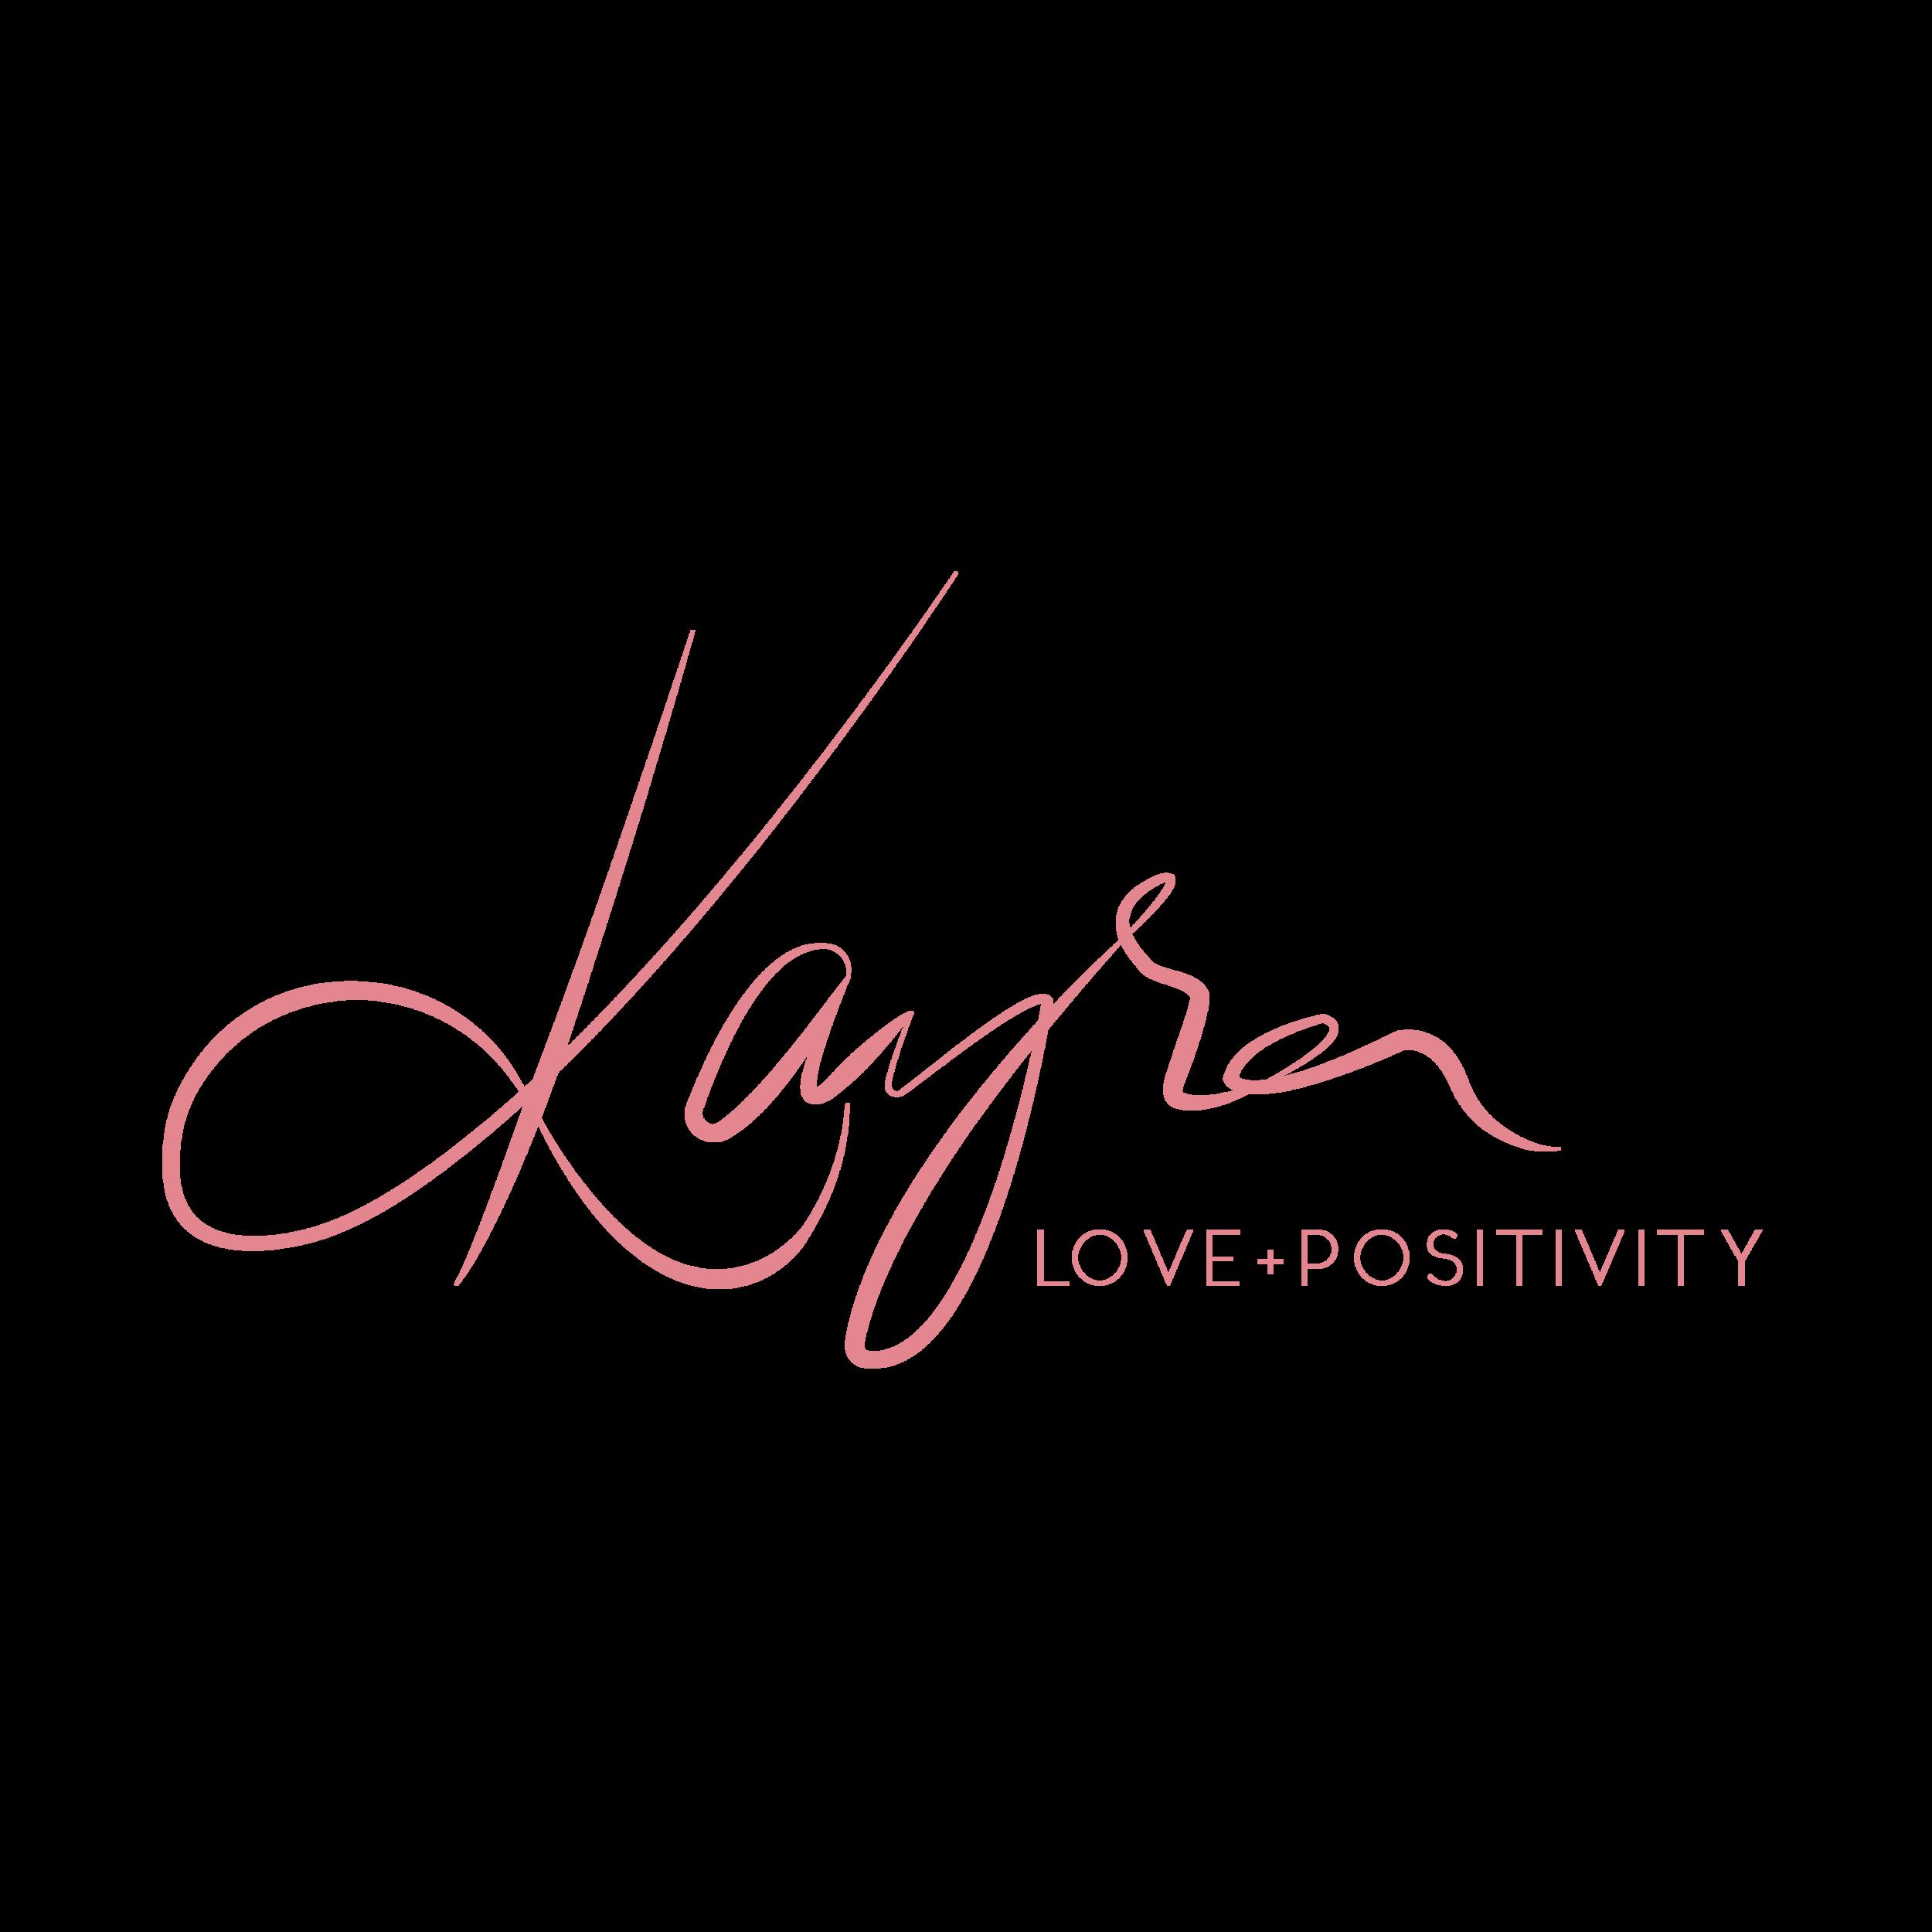 KayraMerrills_Love+Positivity.png